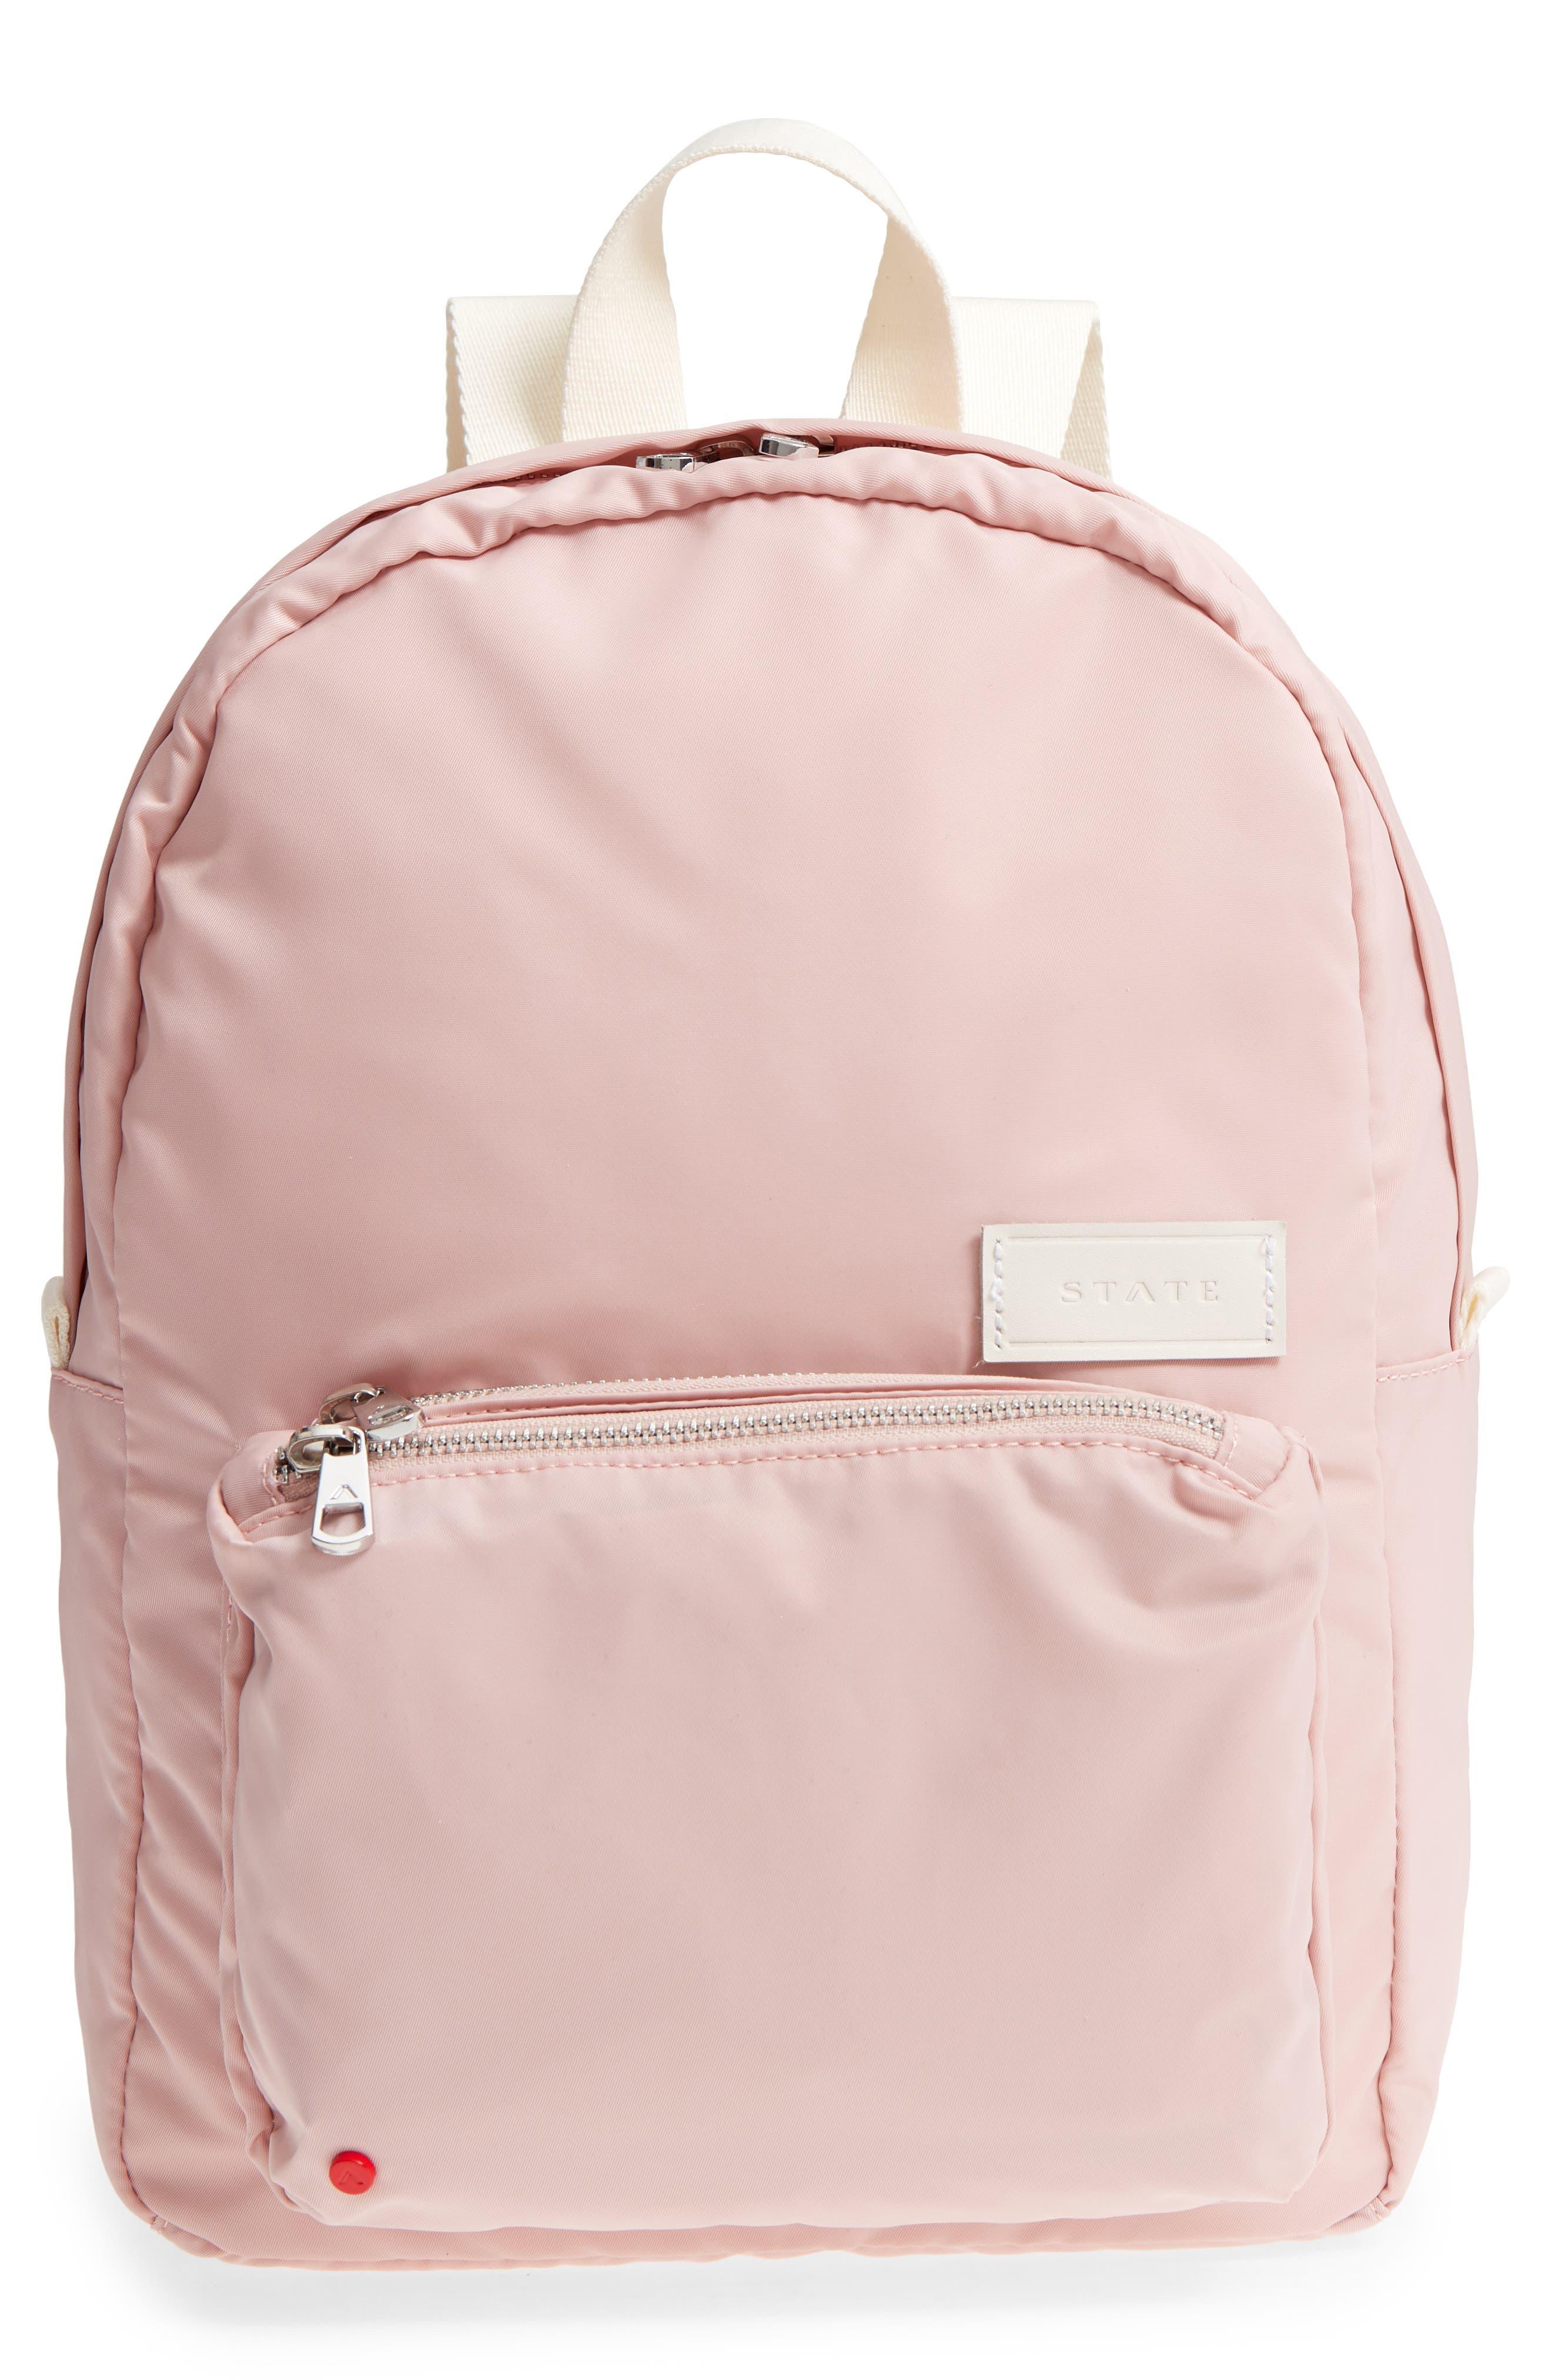 STATE Bags The Heights Mini Lorimer Nylon Backpack